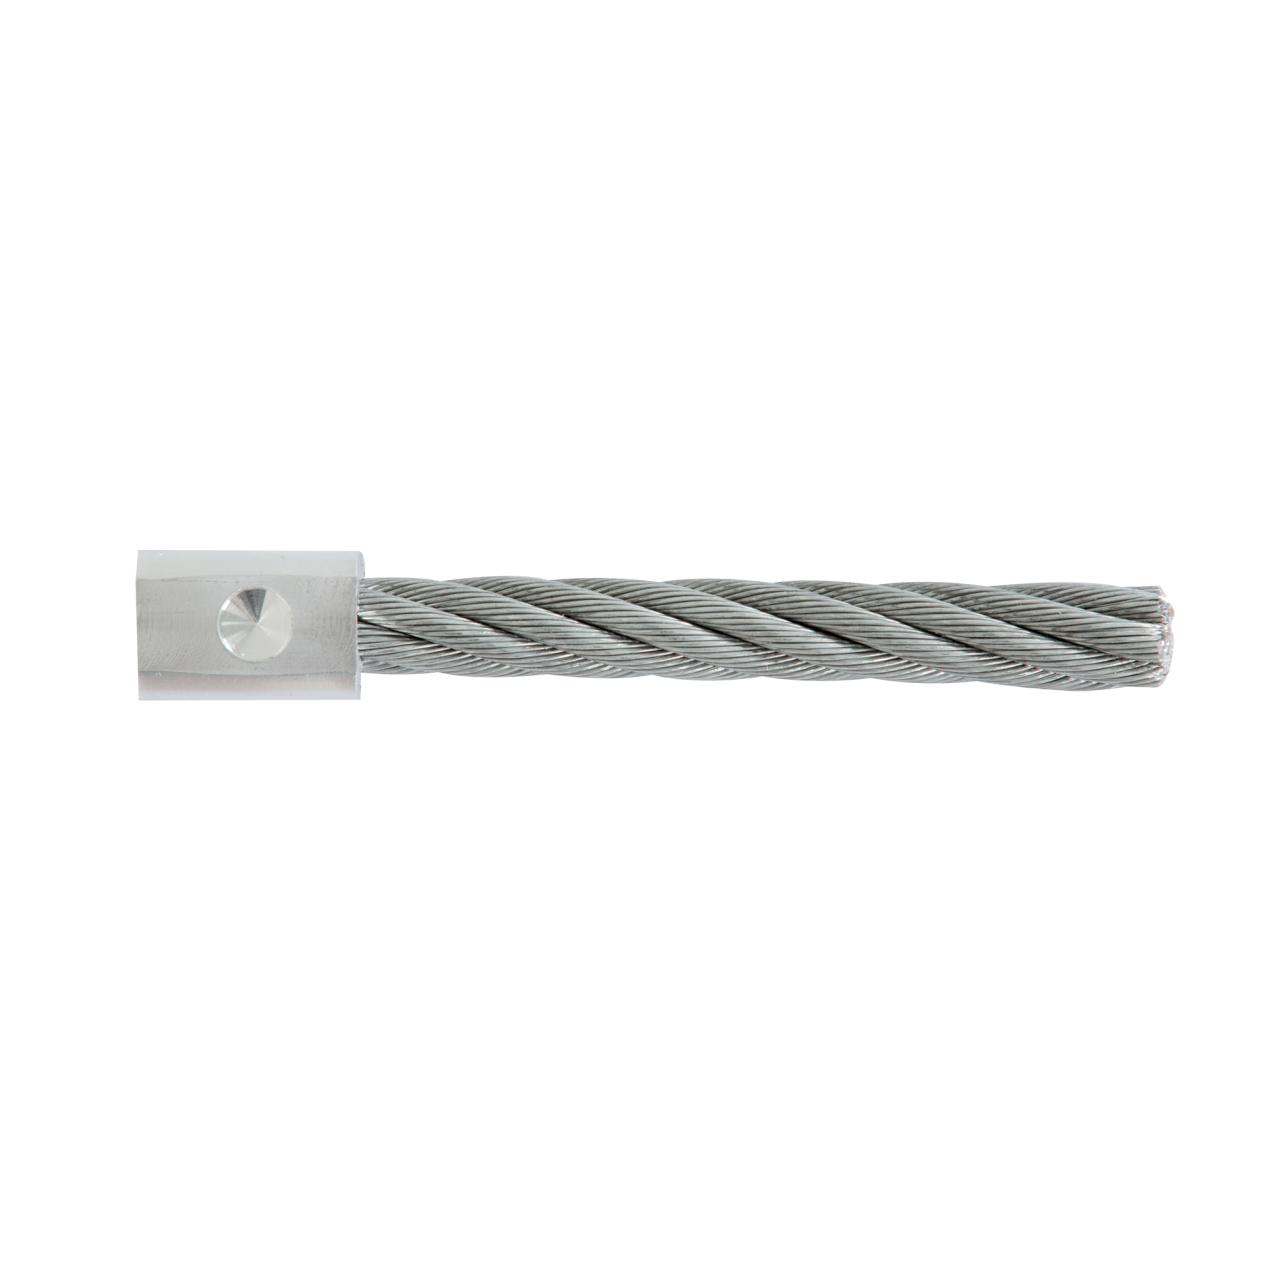 Borstensatz Stahl (10 Stück)